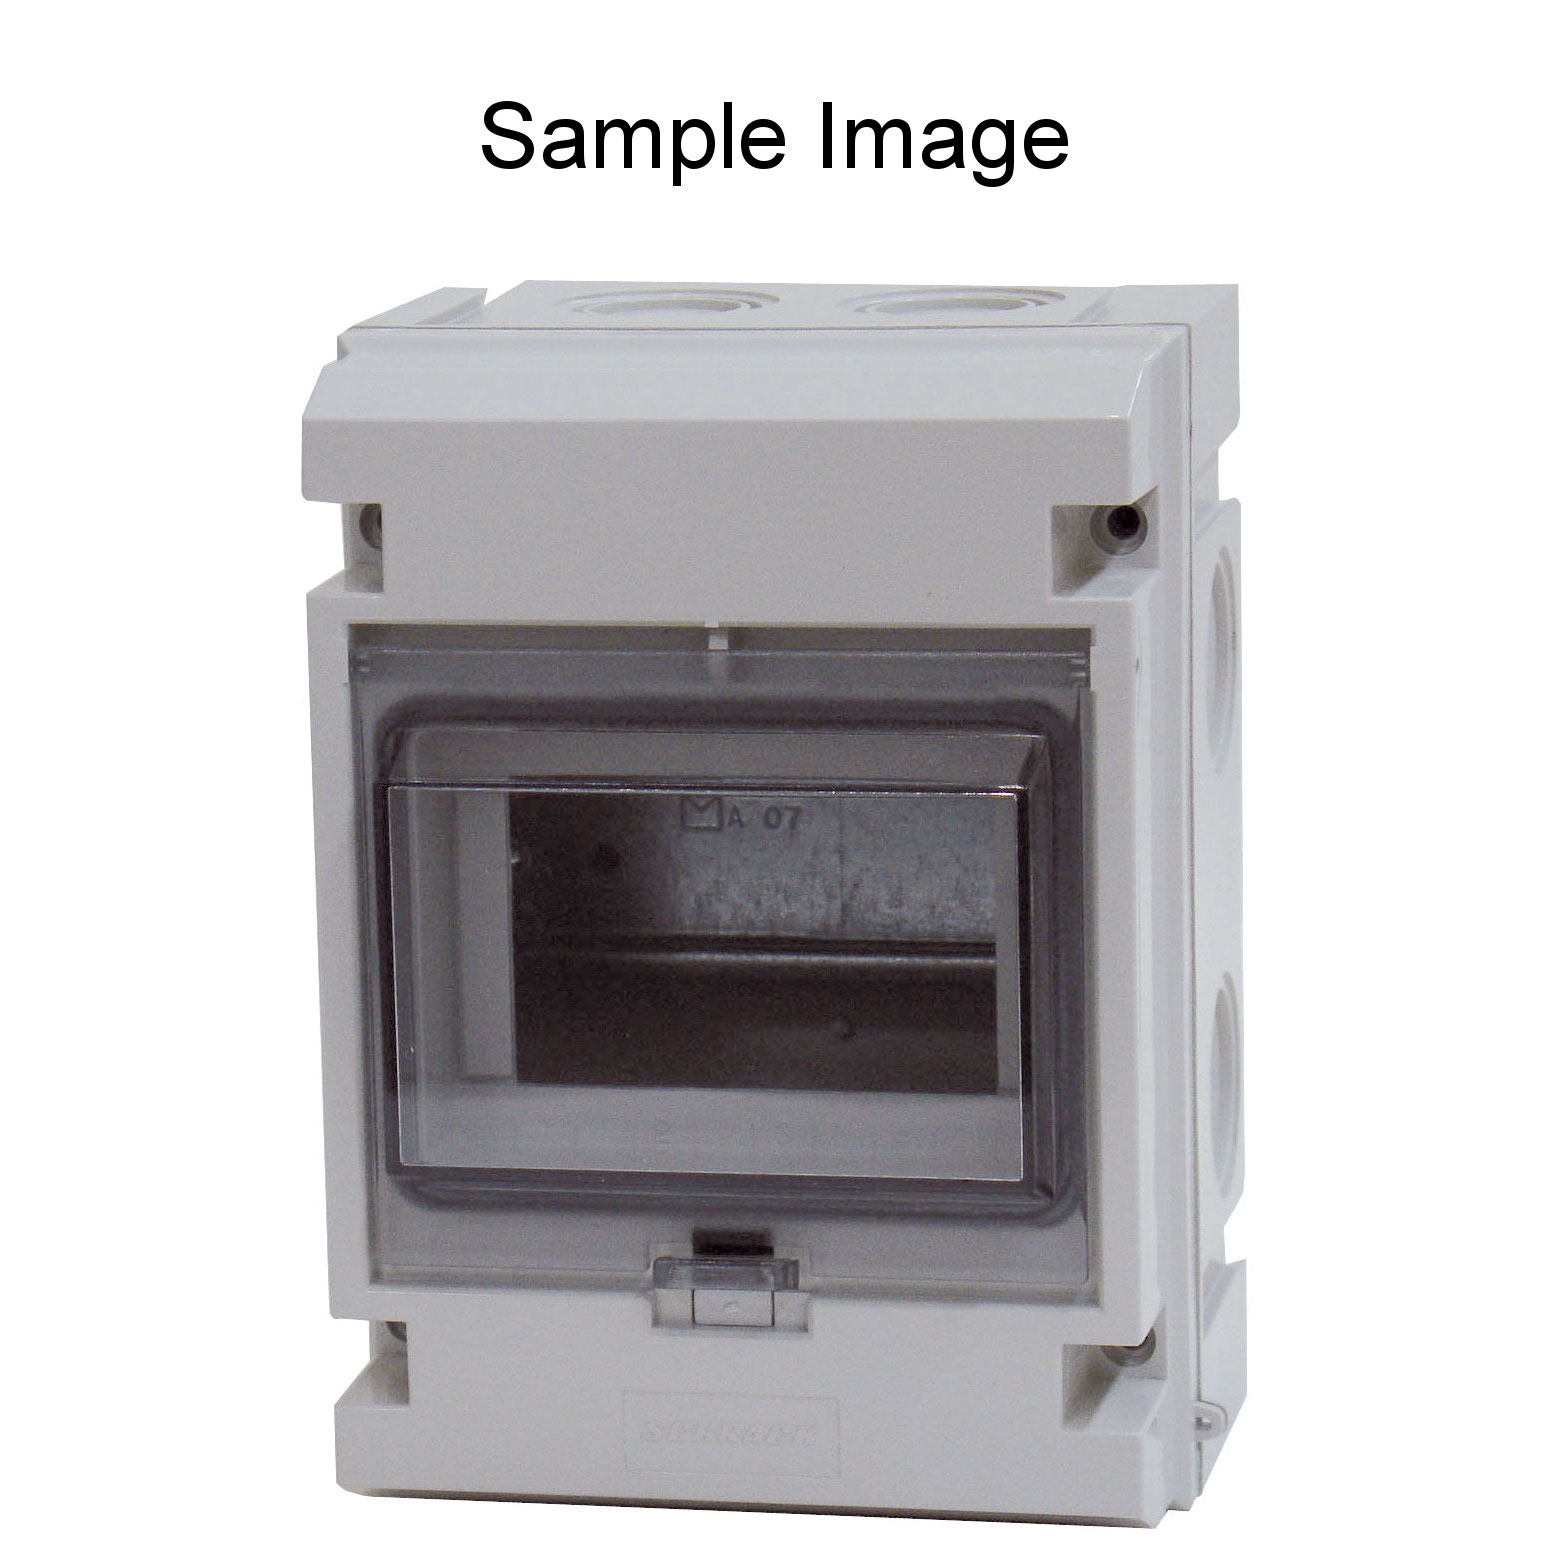 1 Stk Automatengehäuse, 8TE, 1-reihig mit Klappdeckel, IP55 IM009021--